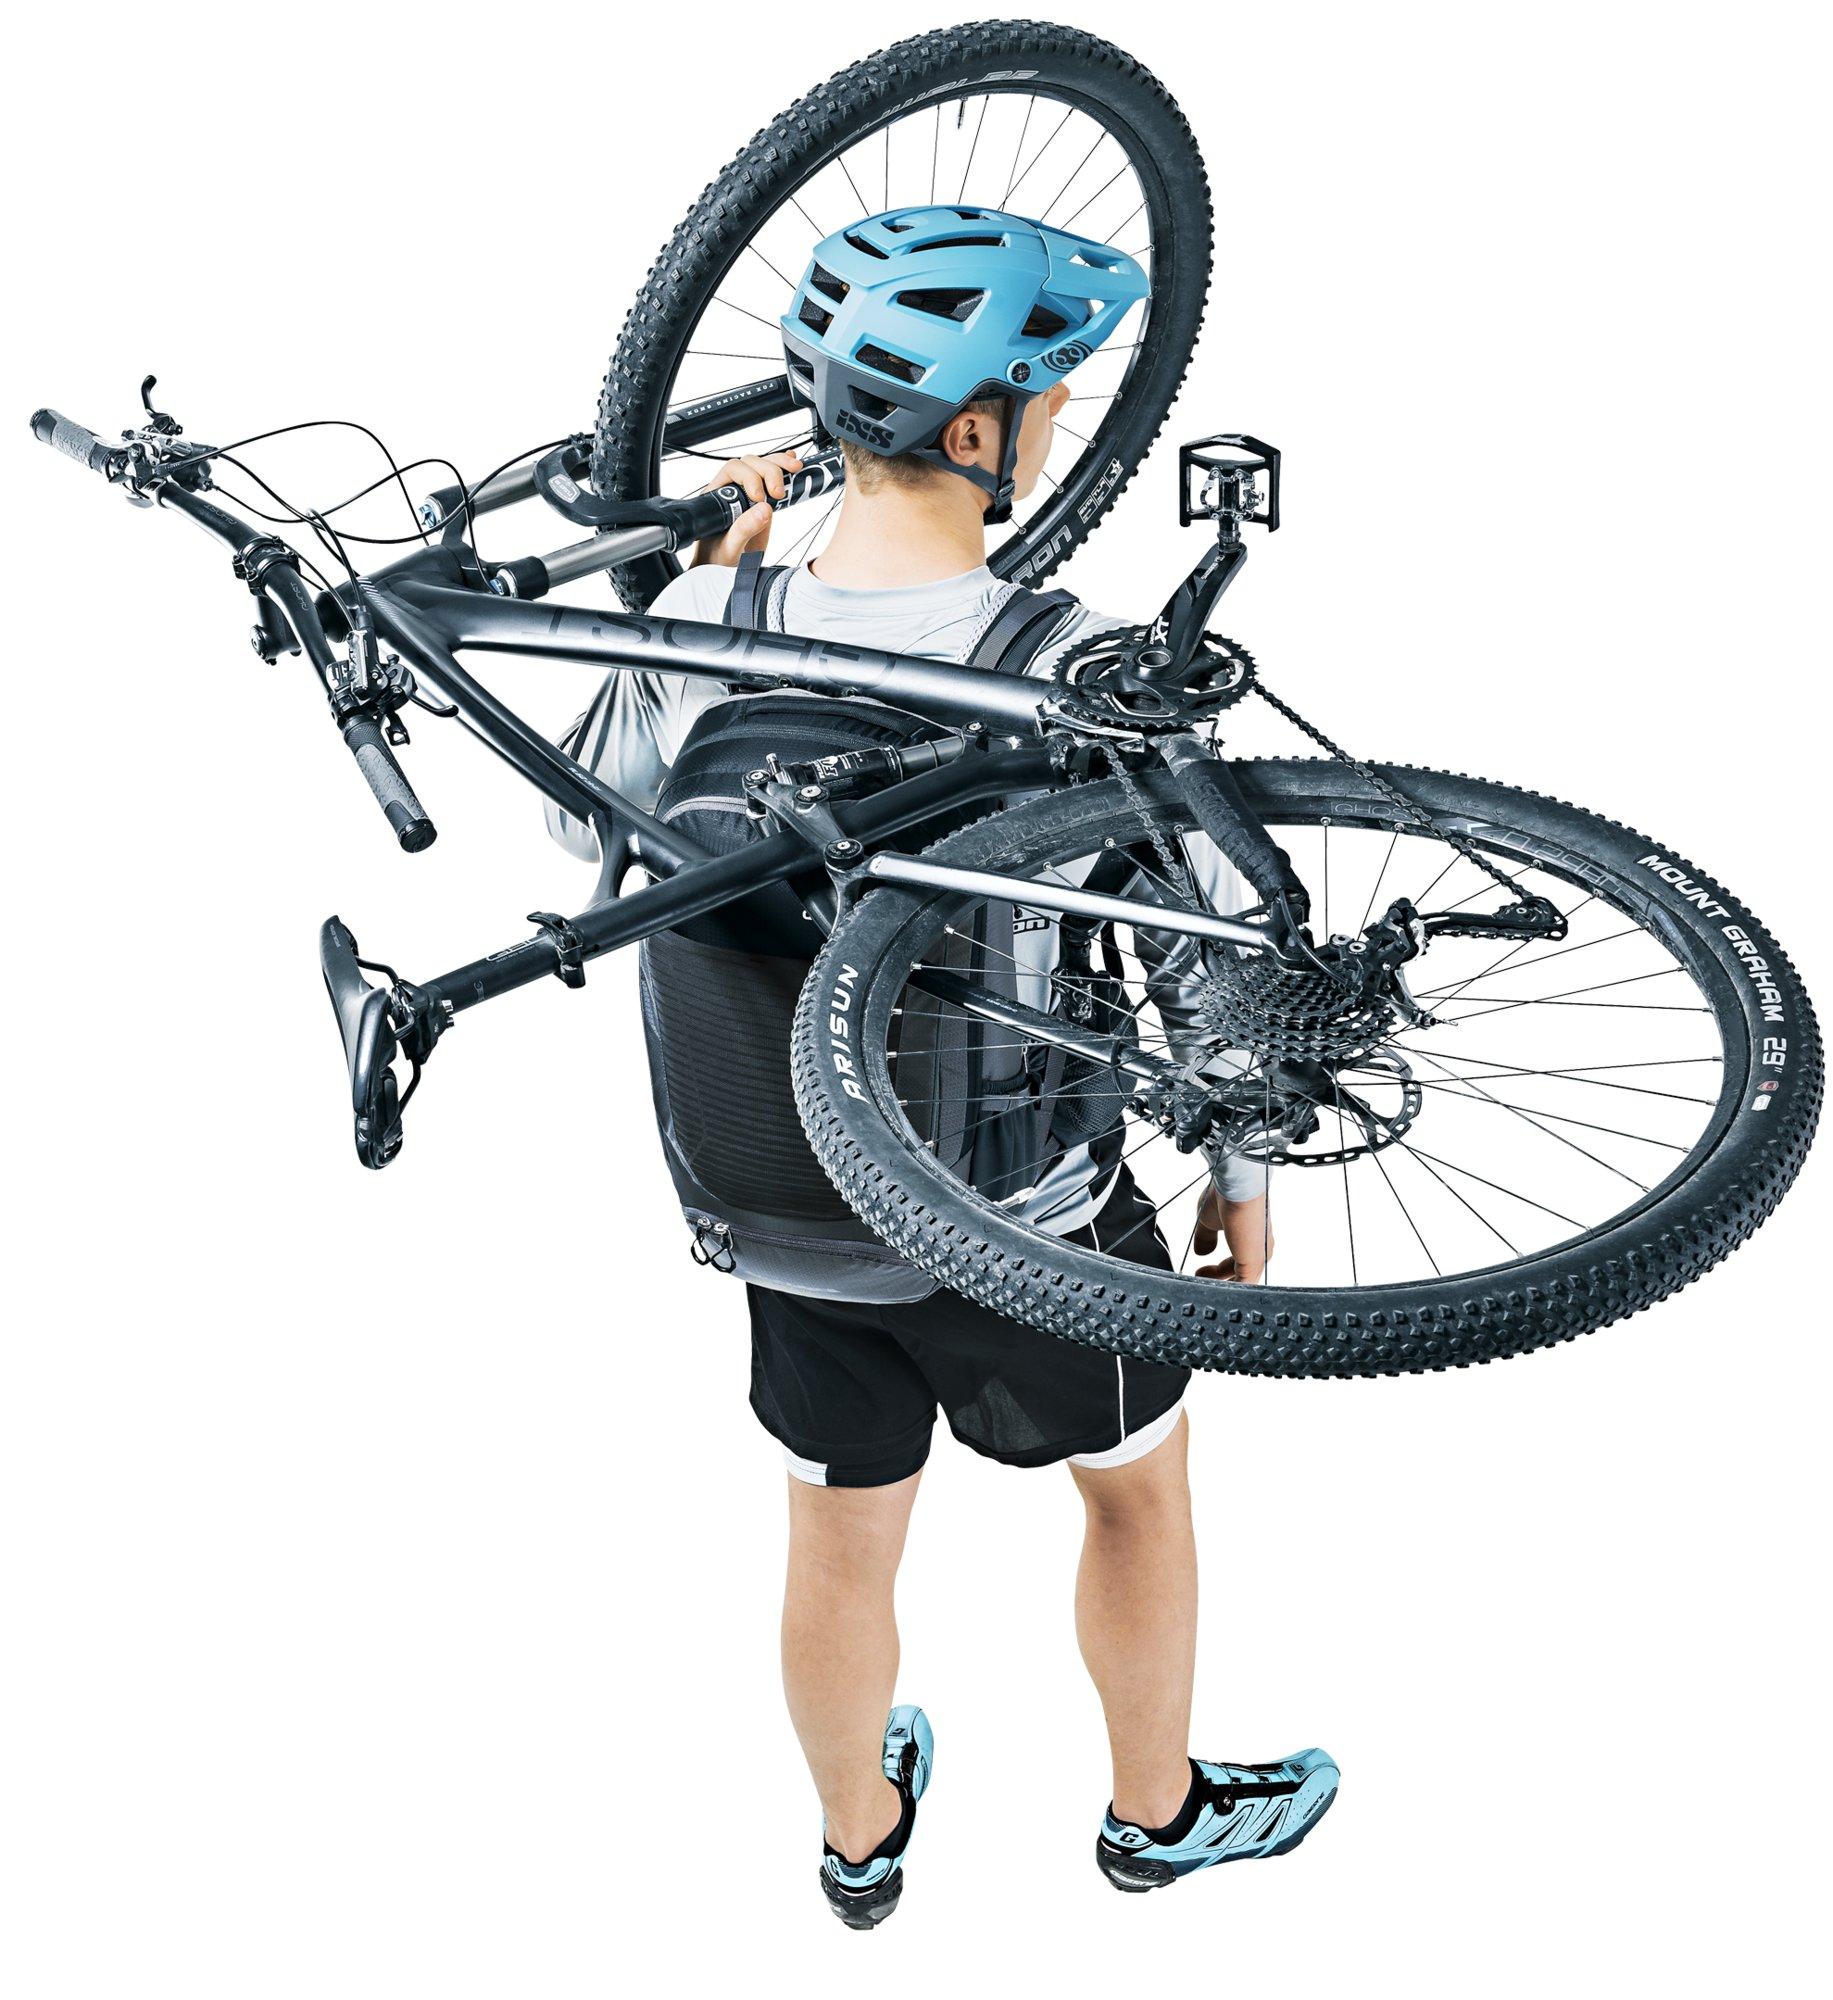 Deuter - Trans Alpine Pro 28, Fahrradrucksack